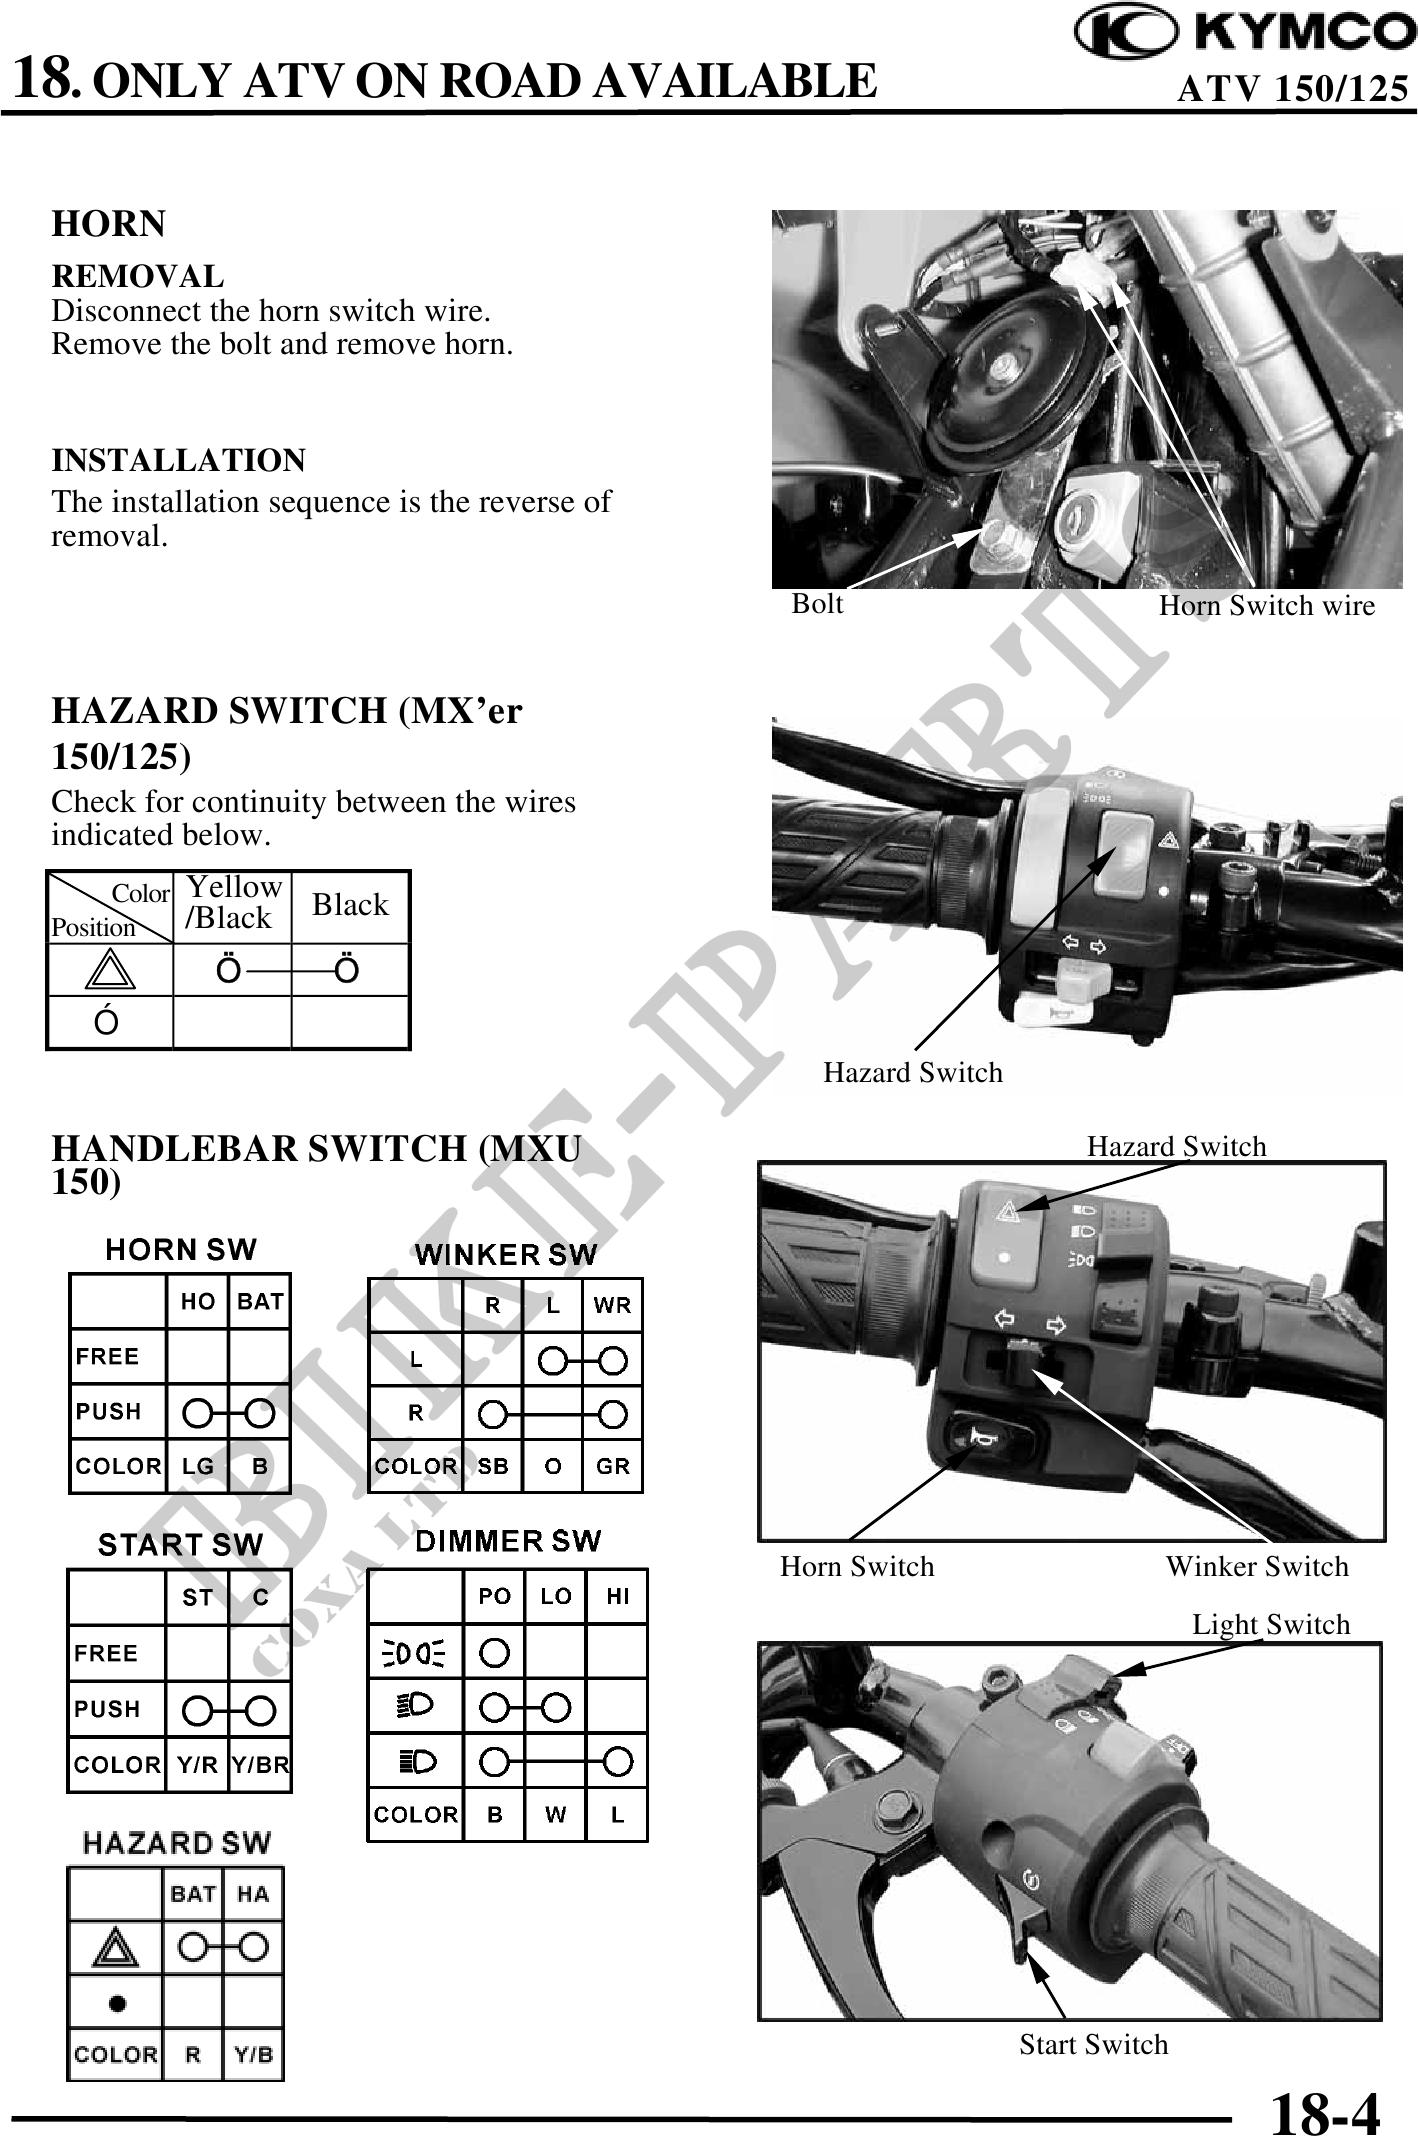 Kymco Dink 150 Service Manual